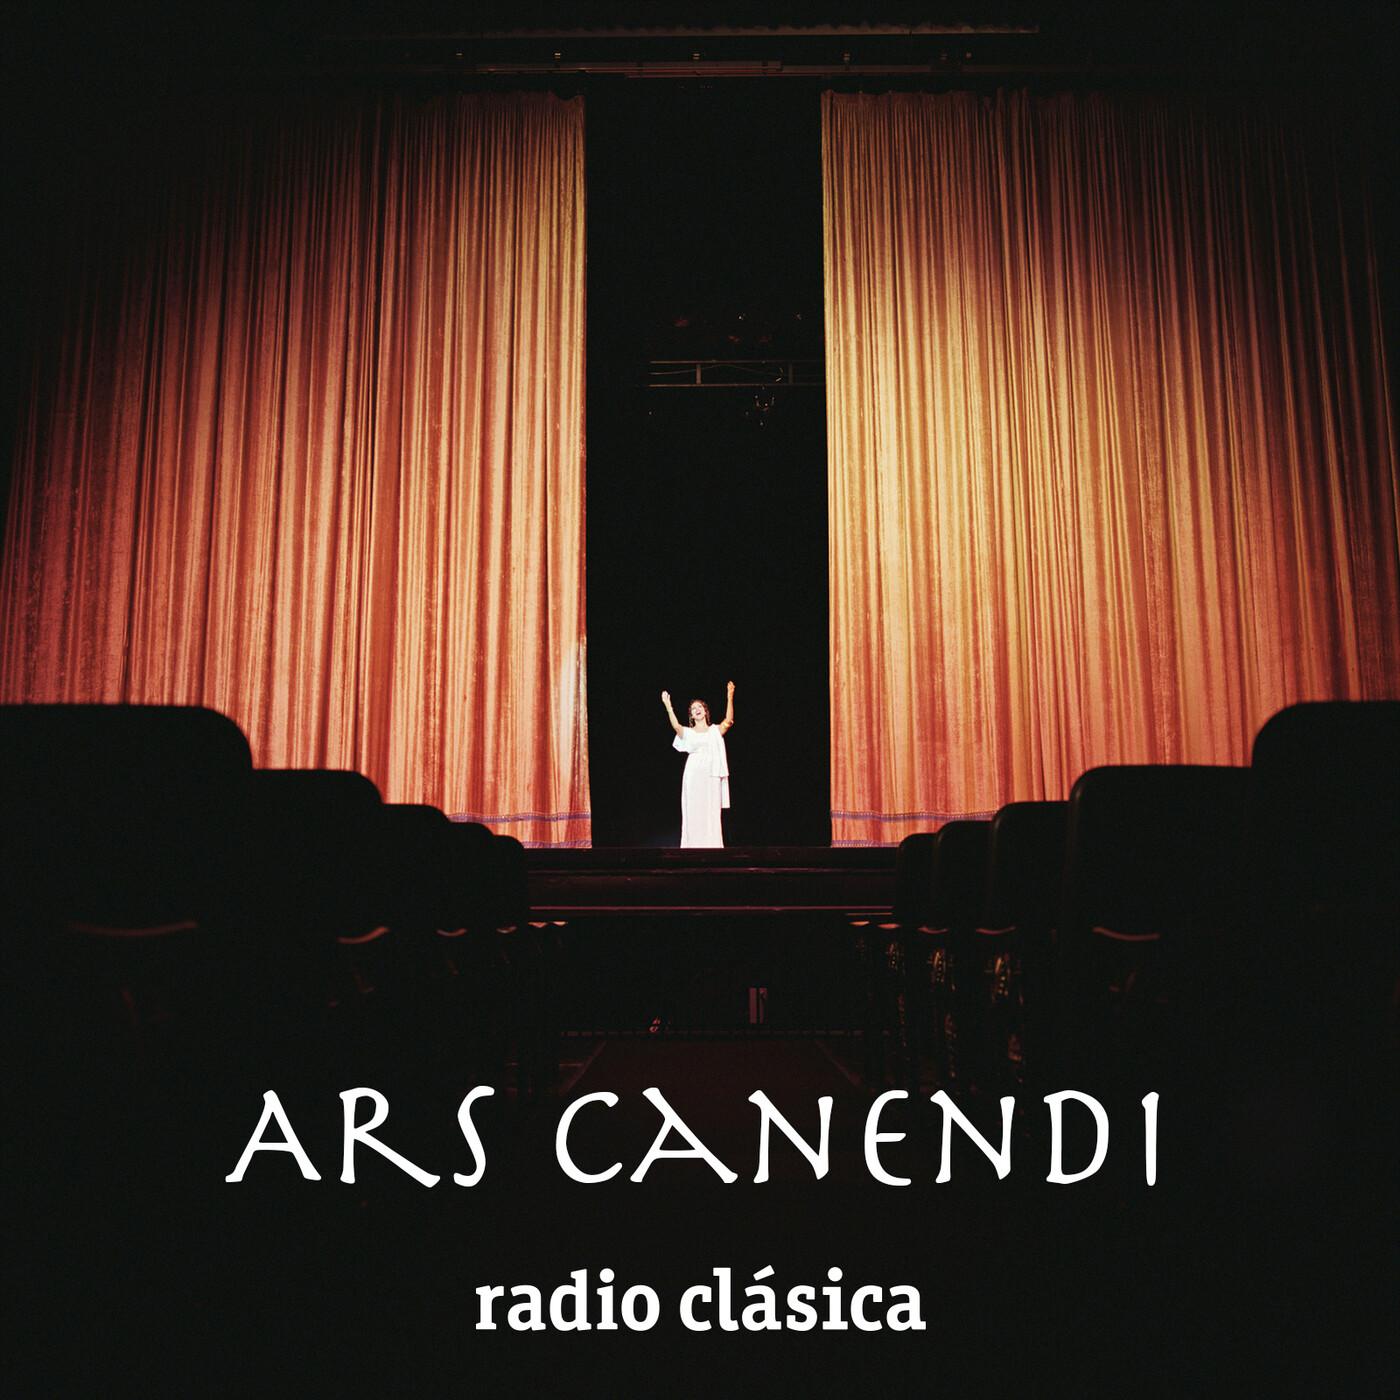 Ars Canendi